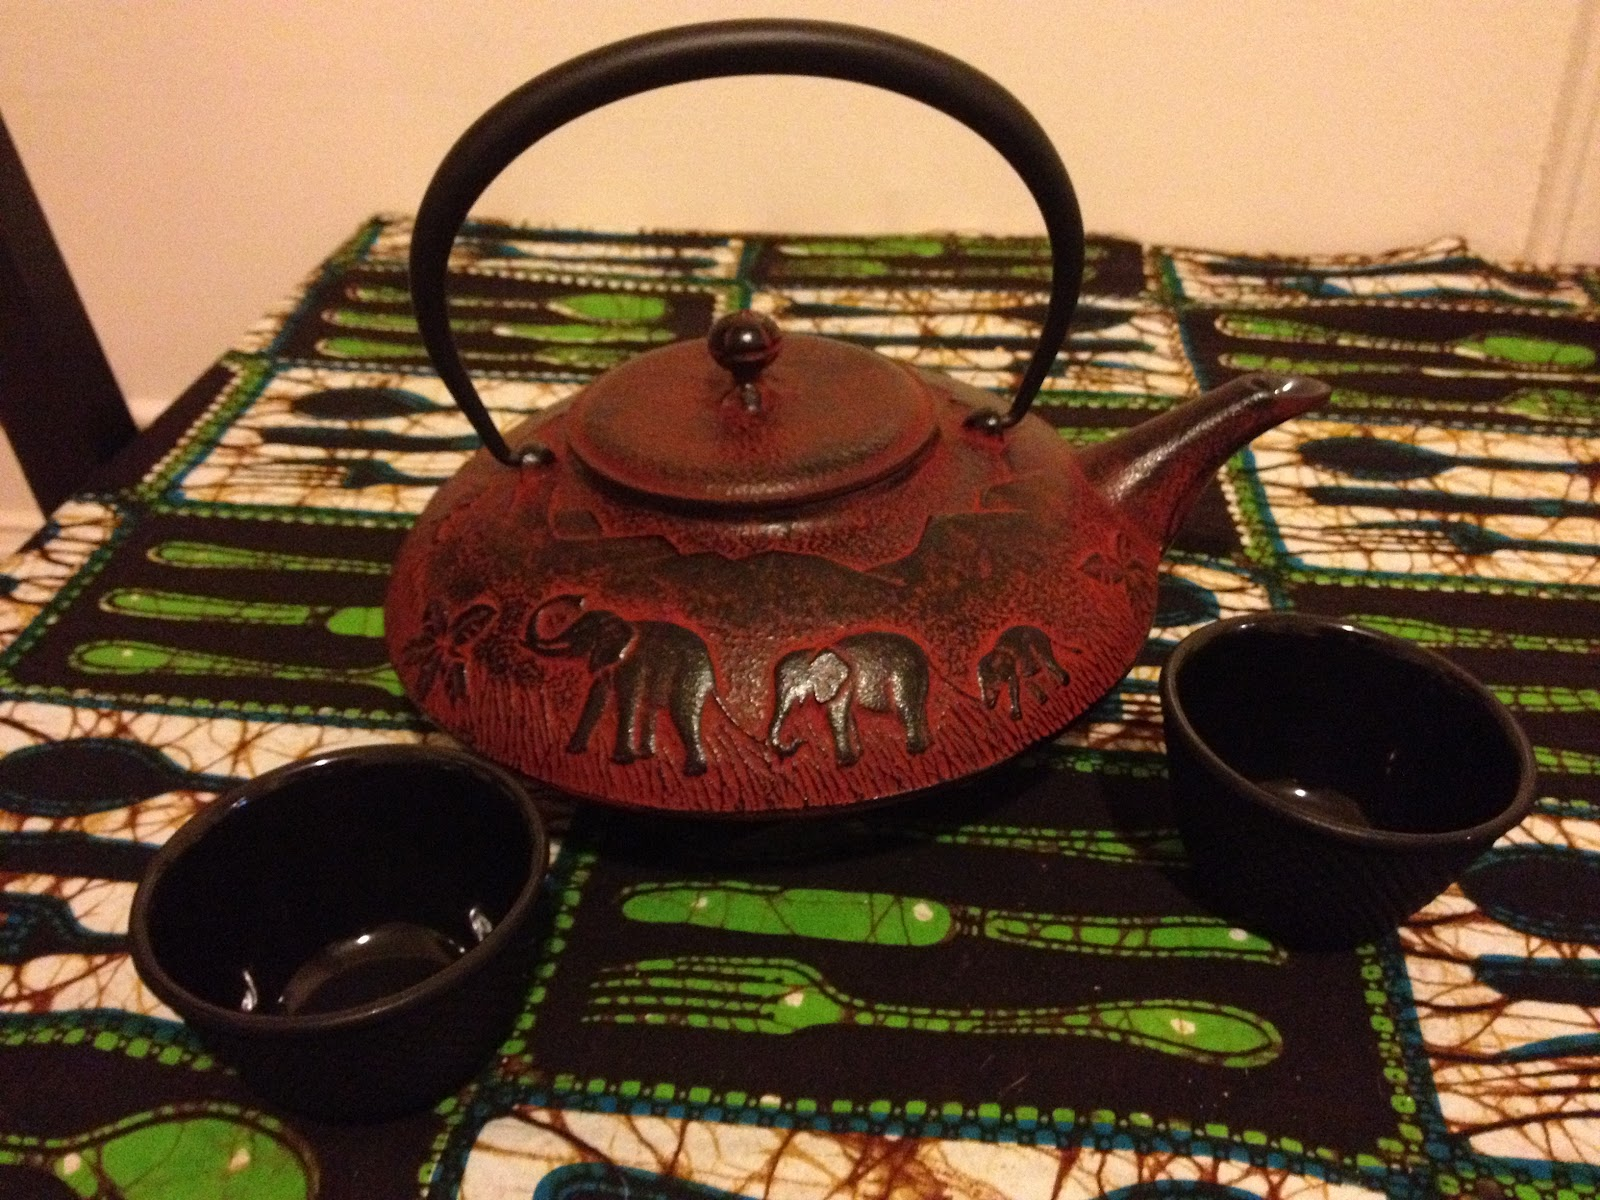 Look to beauty teavana cast iron tea set elephants and green tea - Elephant cast iron teapot ...